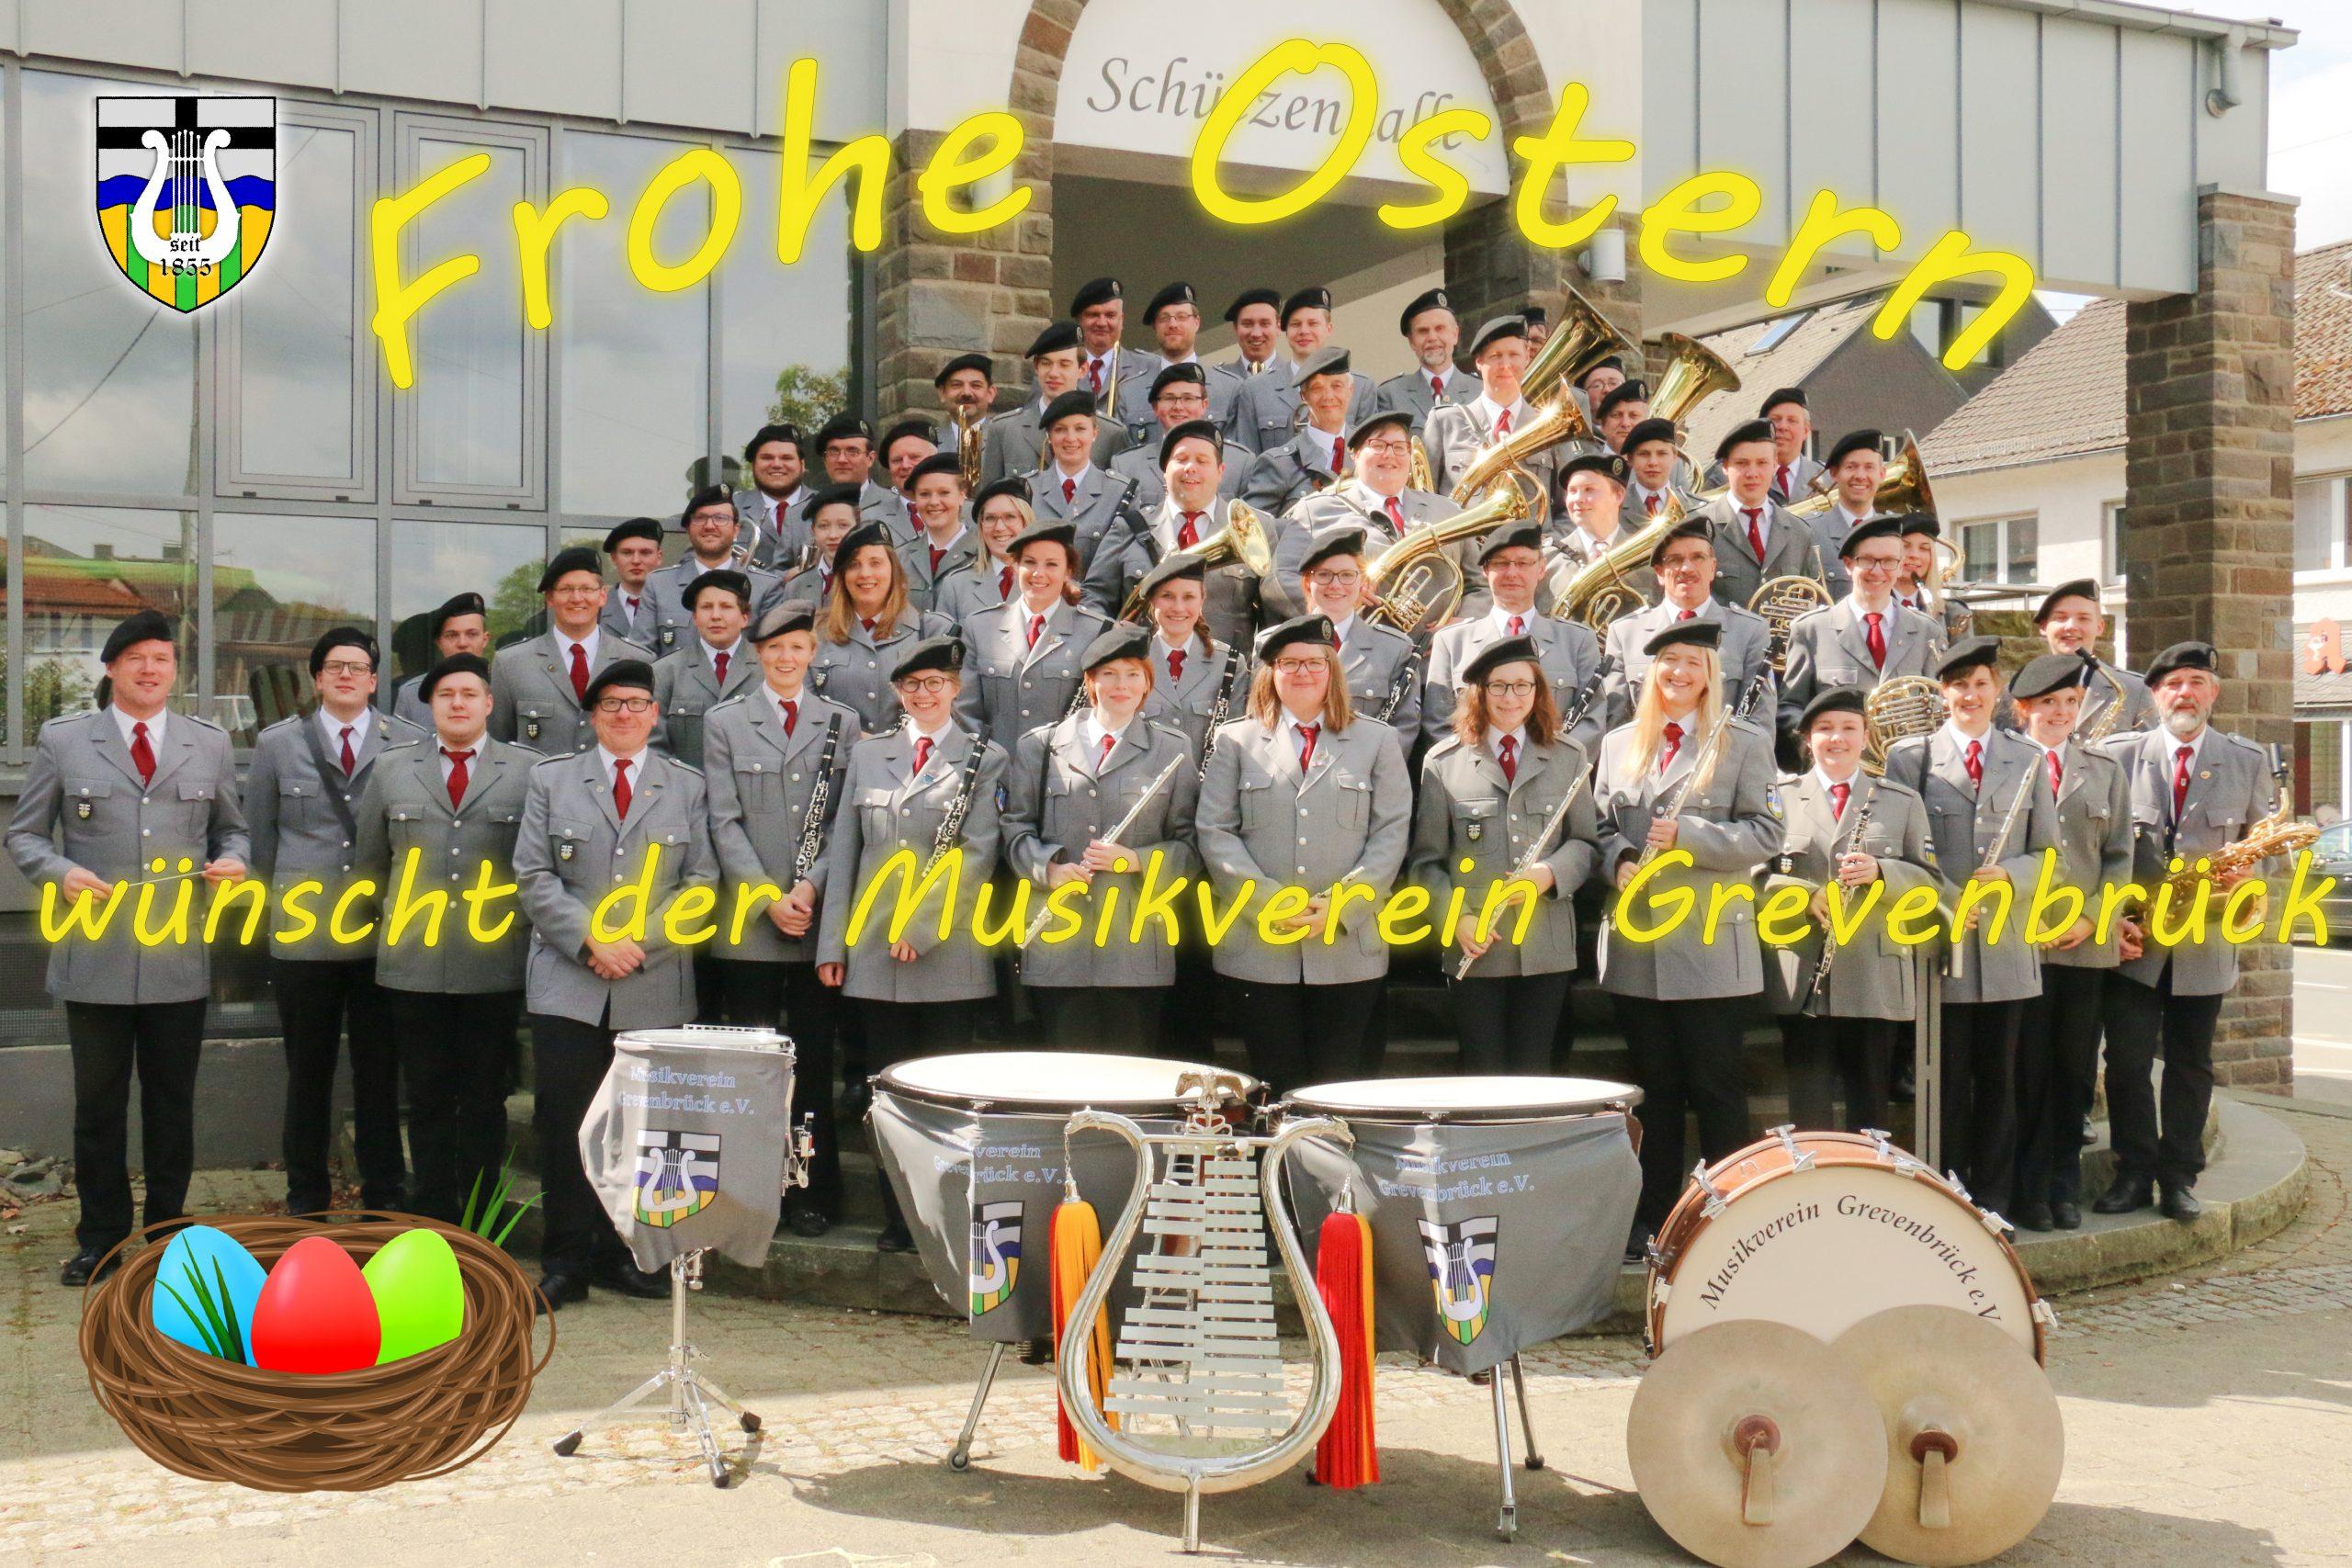 Der Musikverein Grevenbrück wünscht euch frohe Ostertage! ☀️🐰